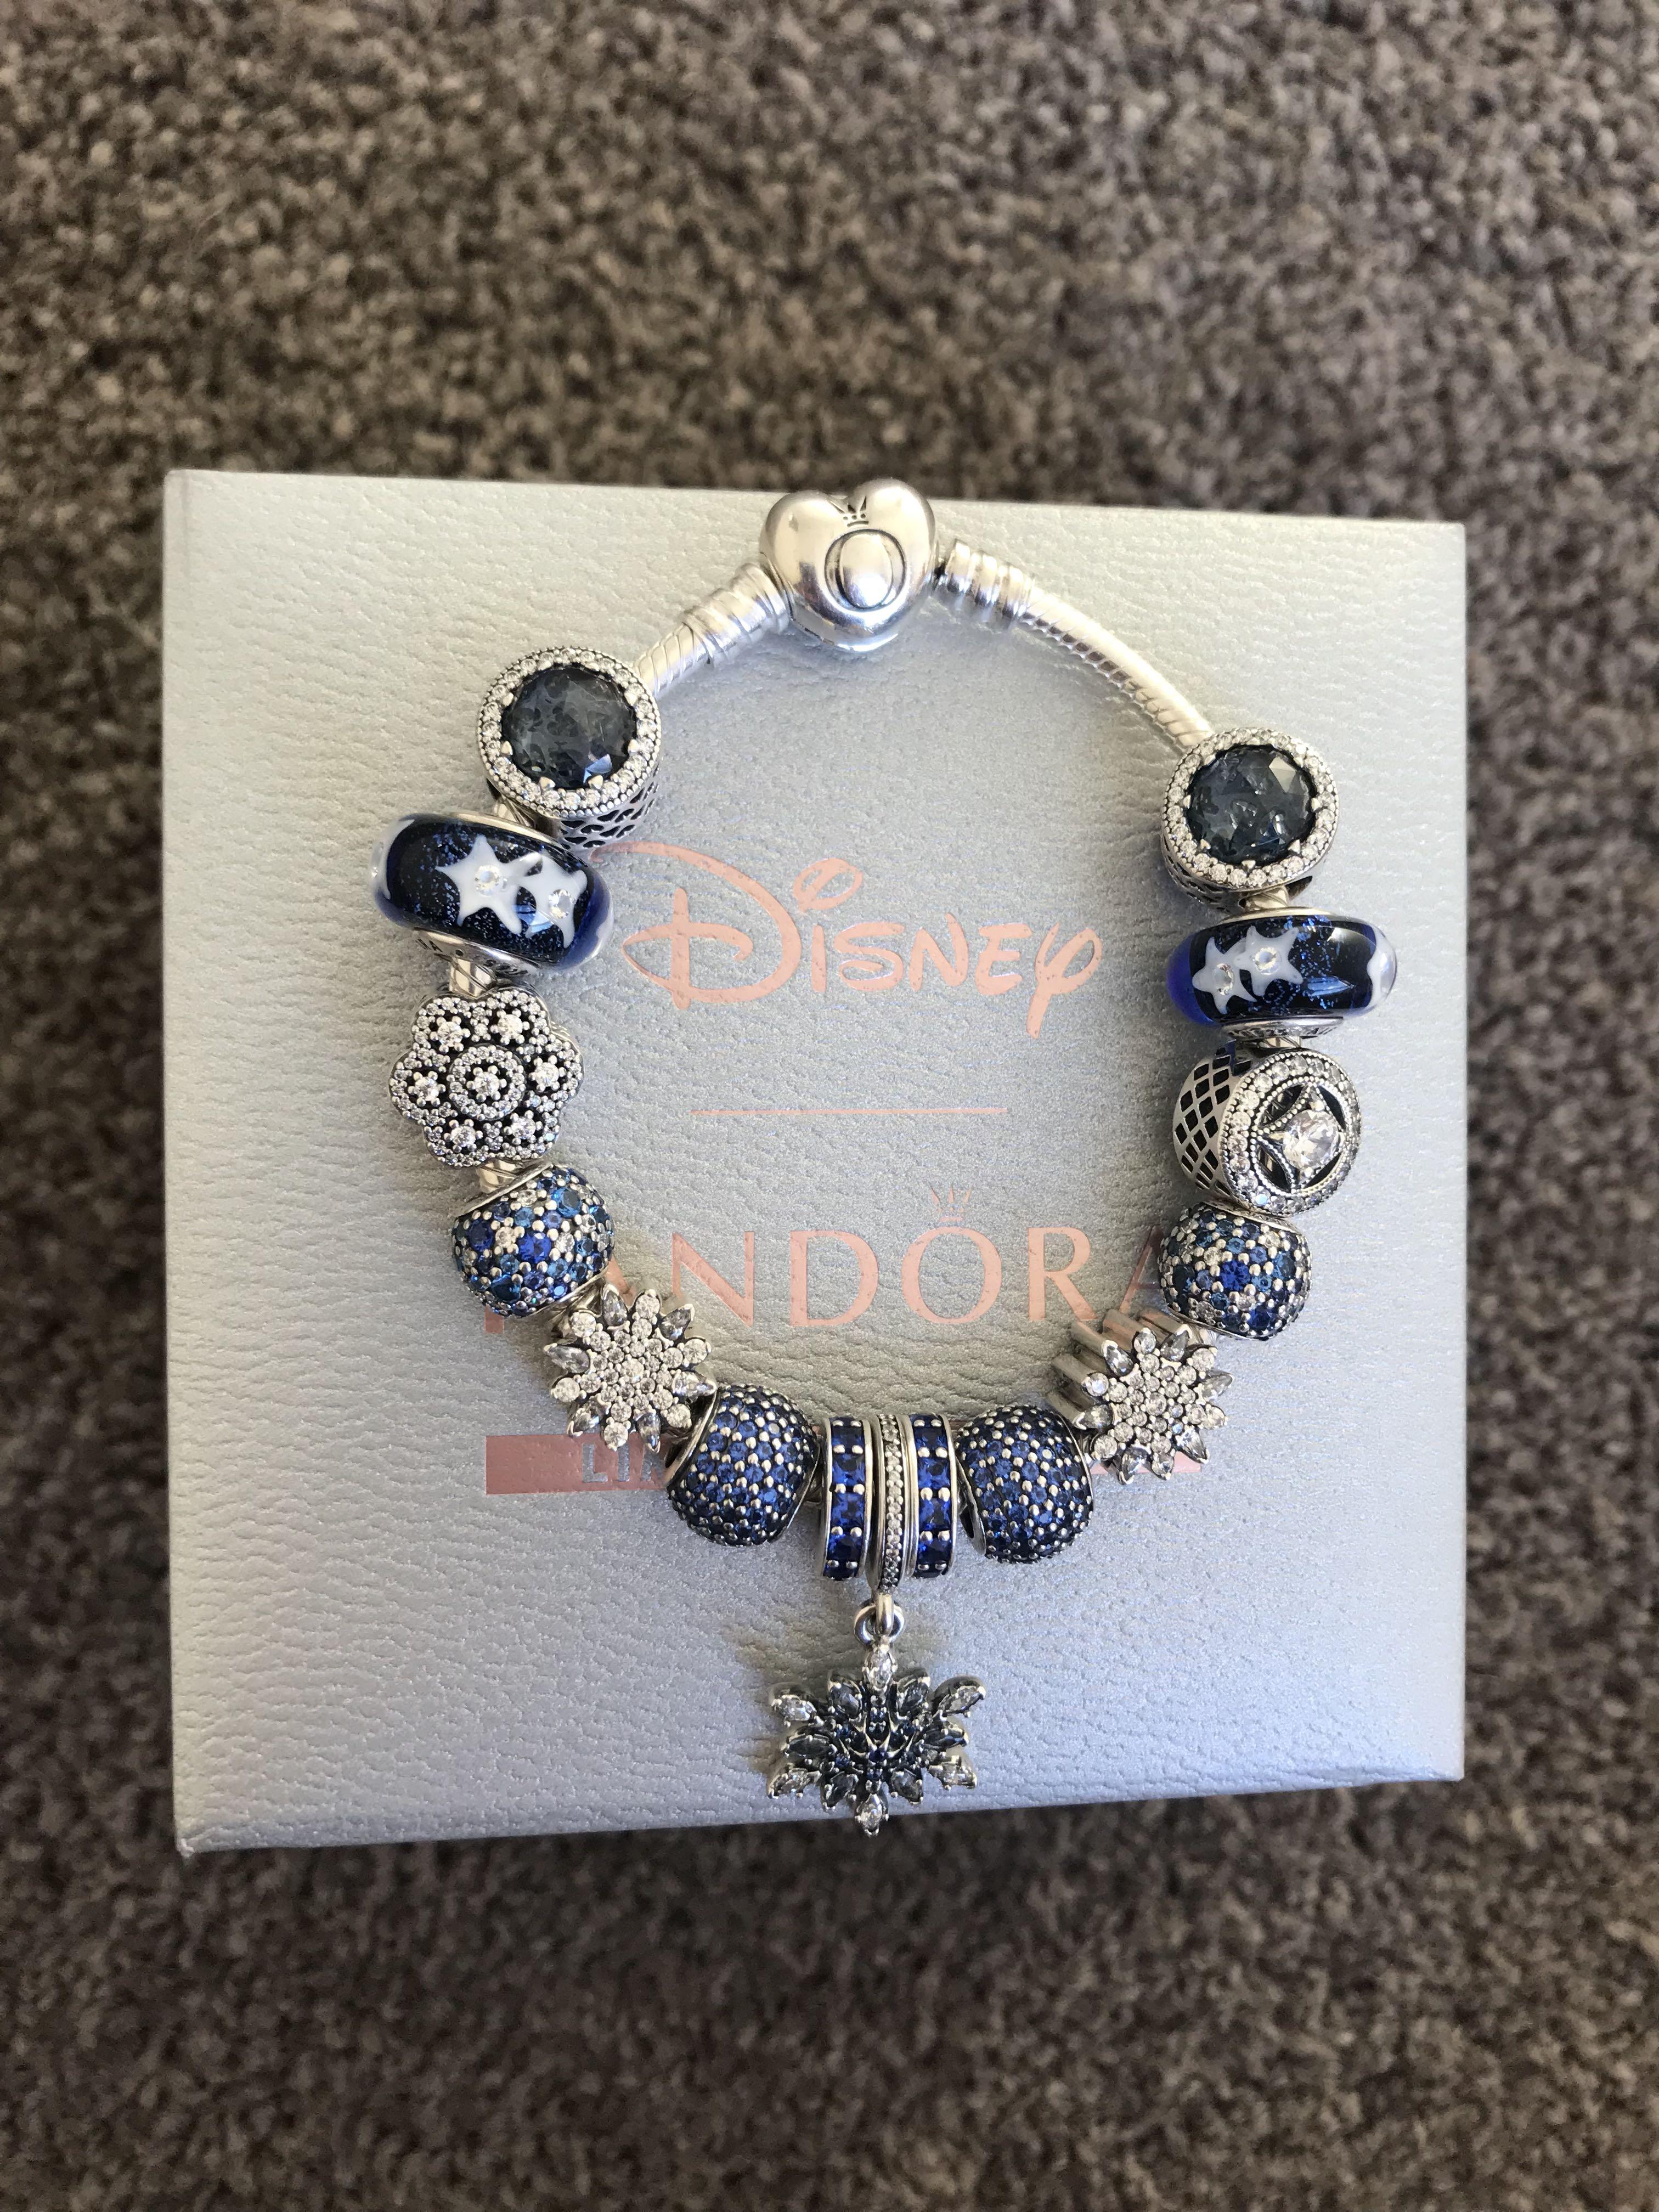 Authentic Pandora Bracelet with charms